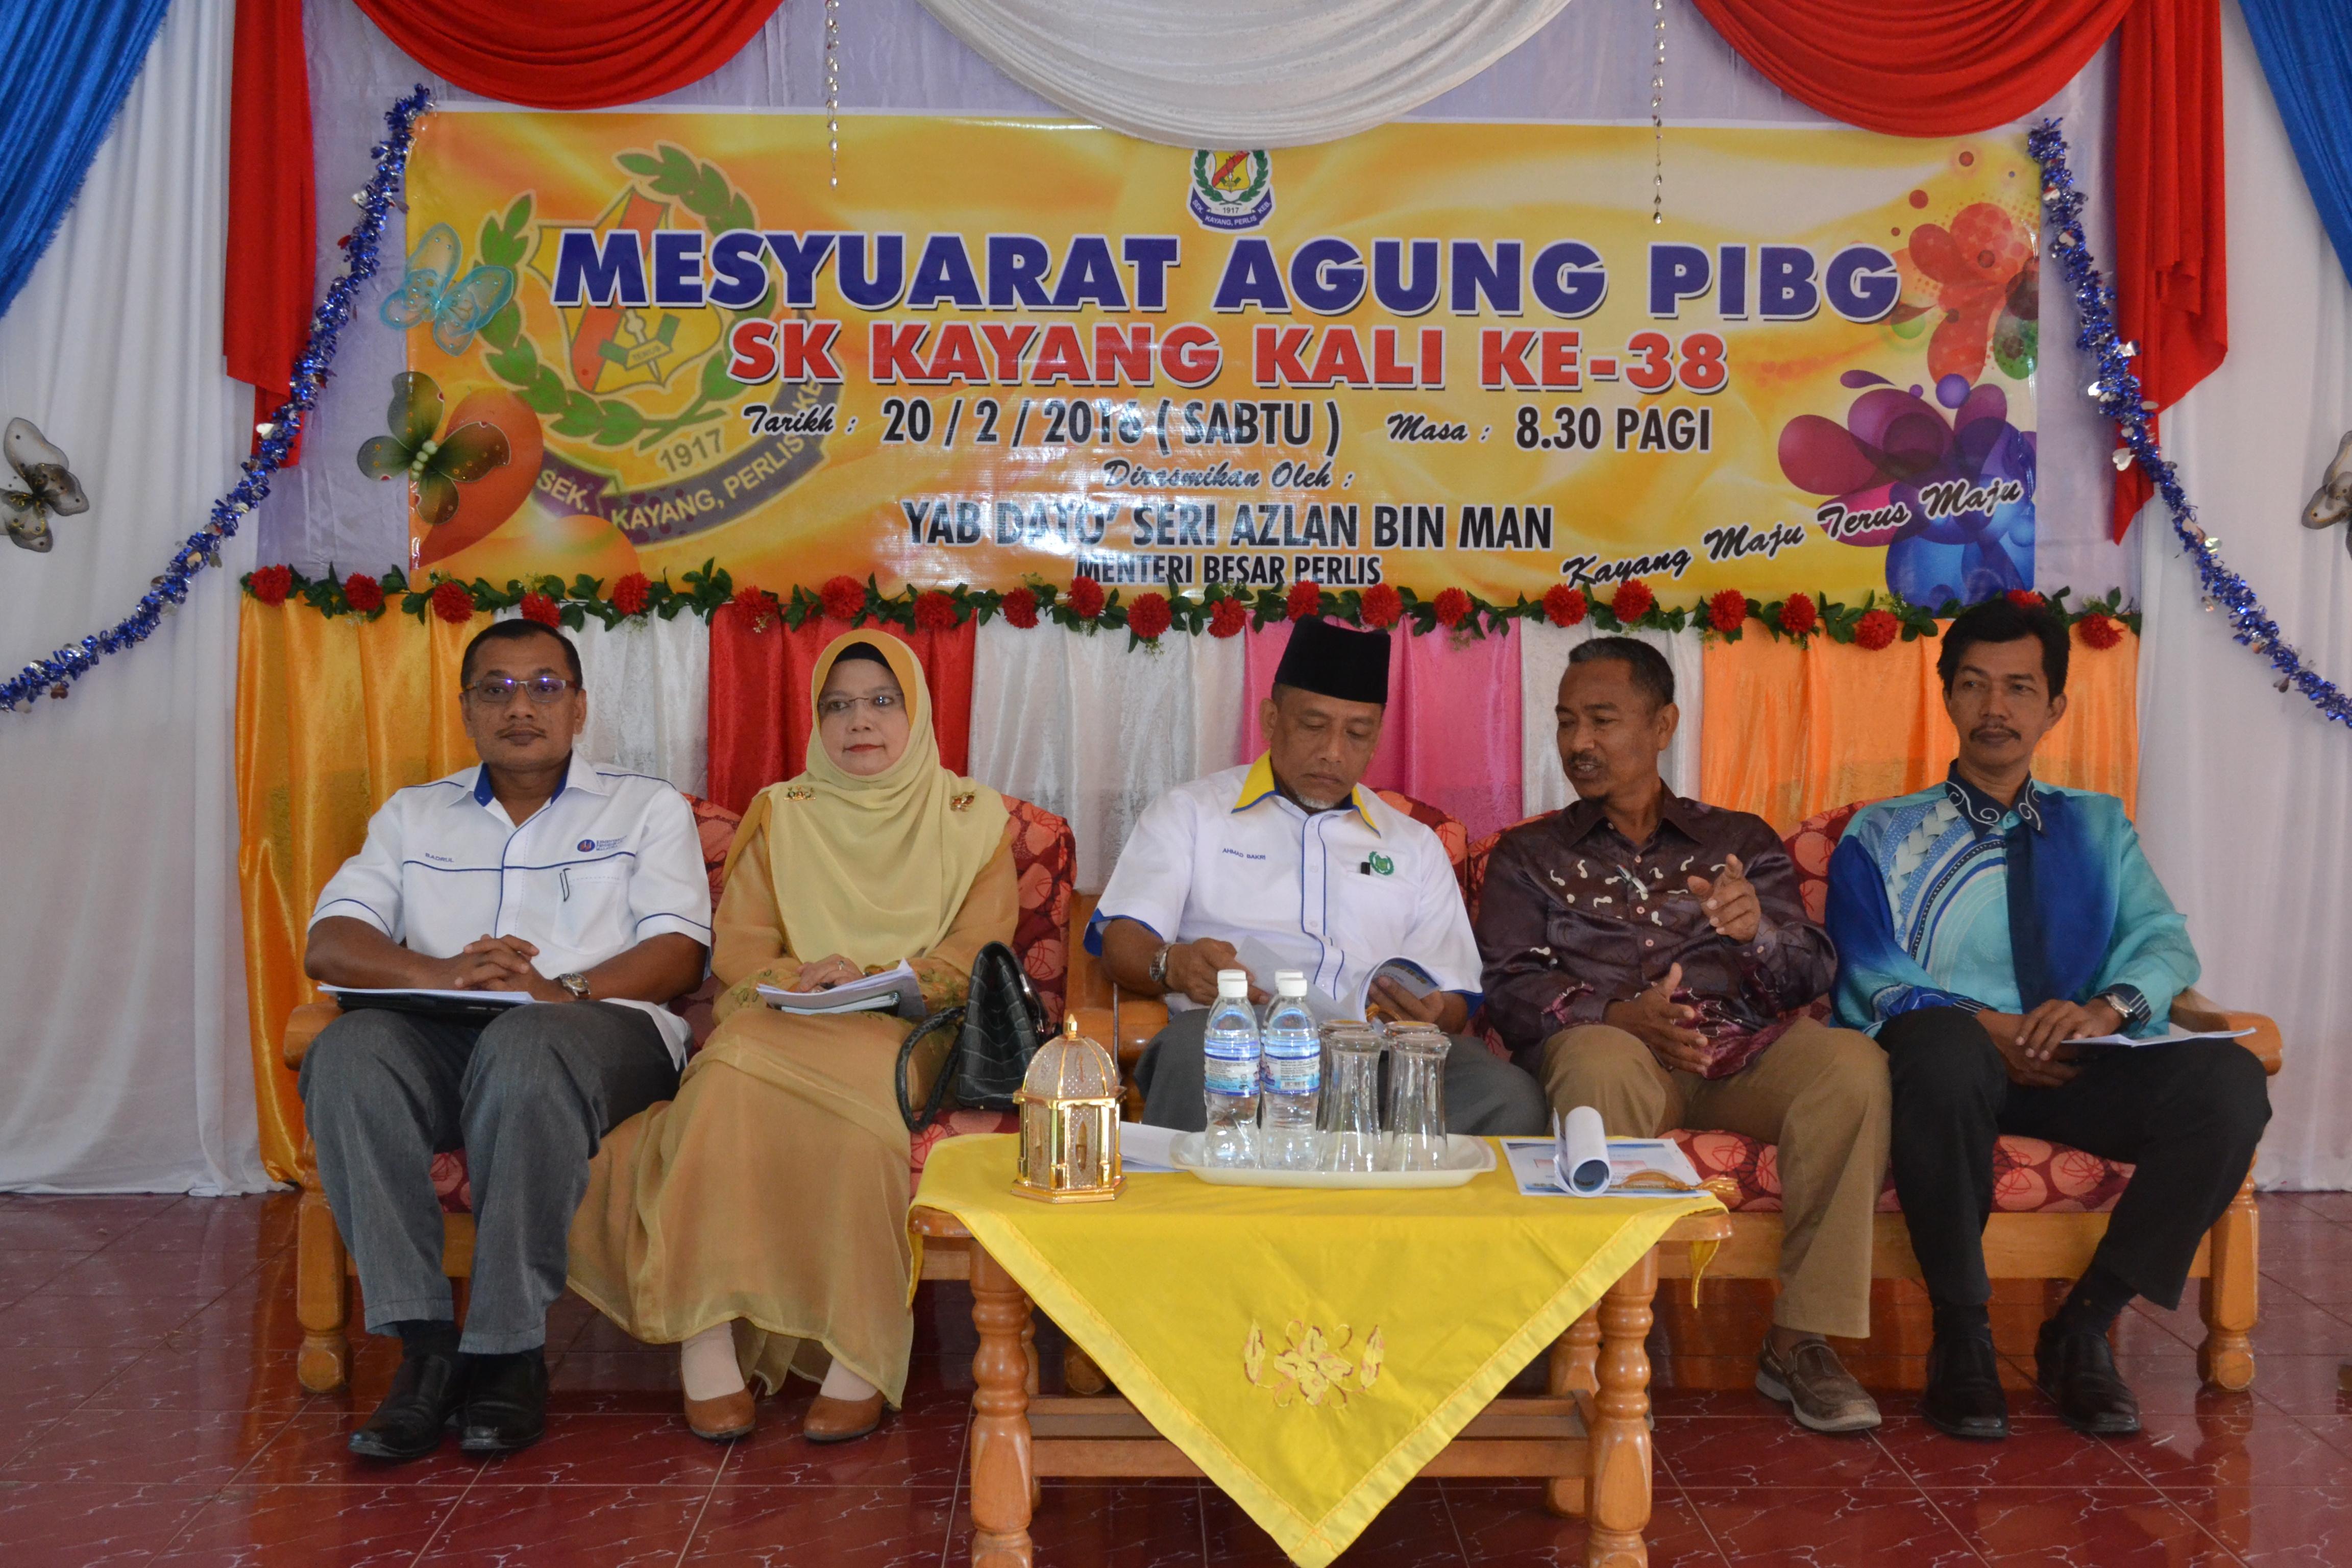 mesy-agong-pibg-26